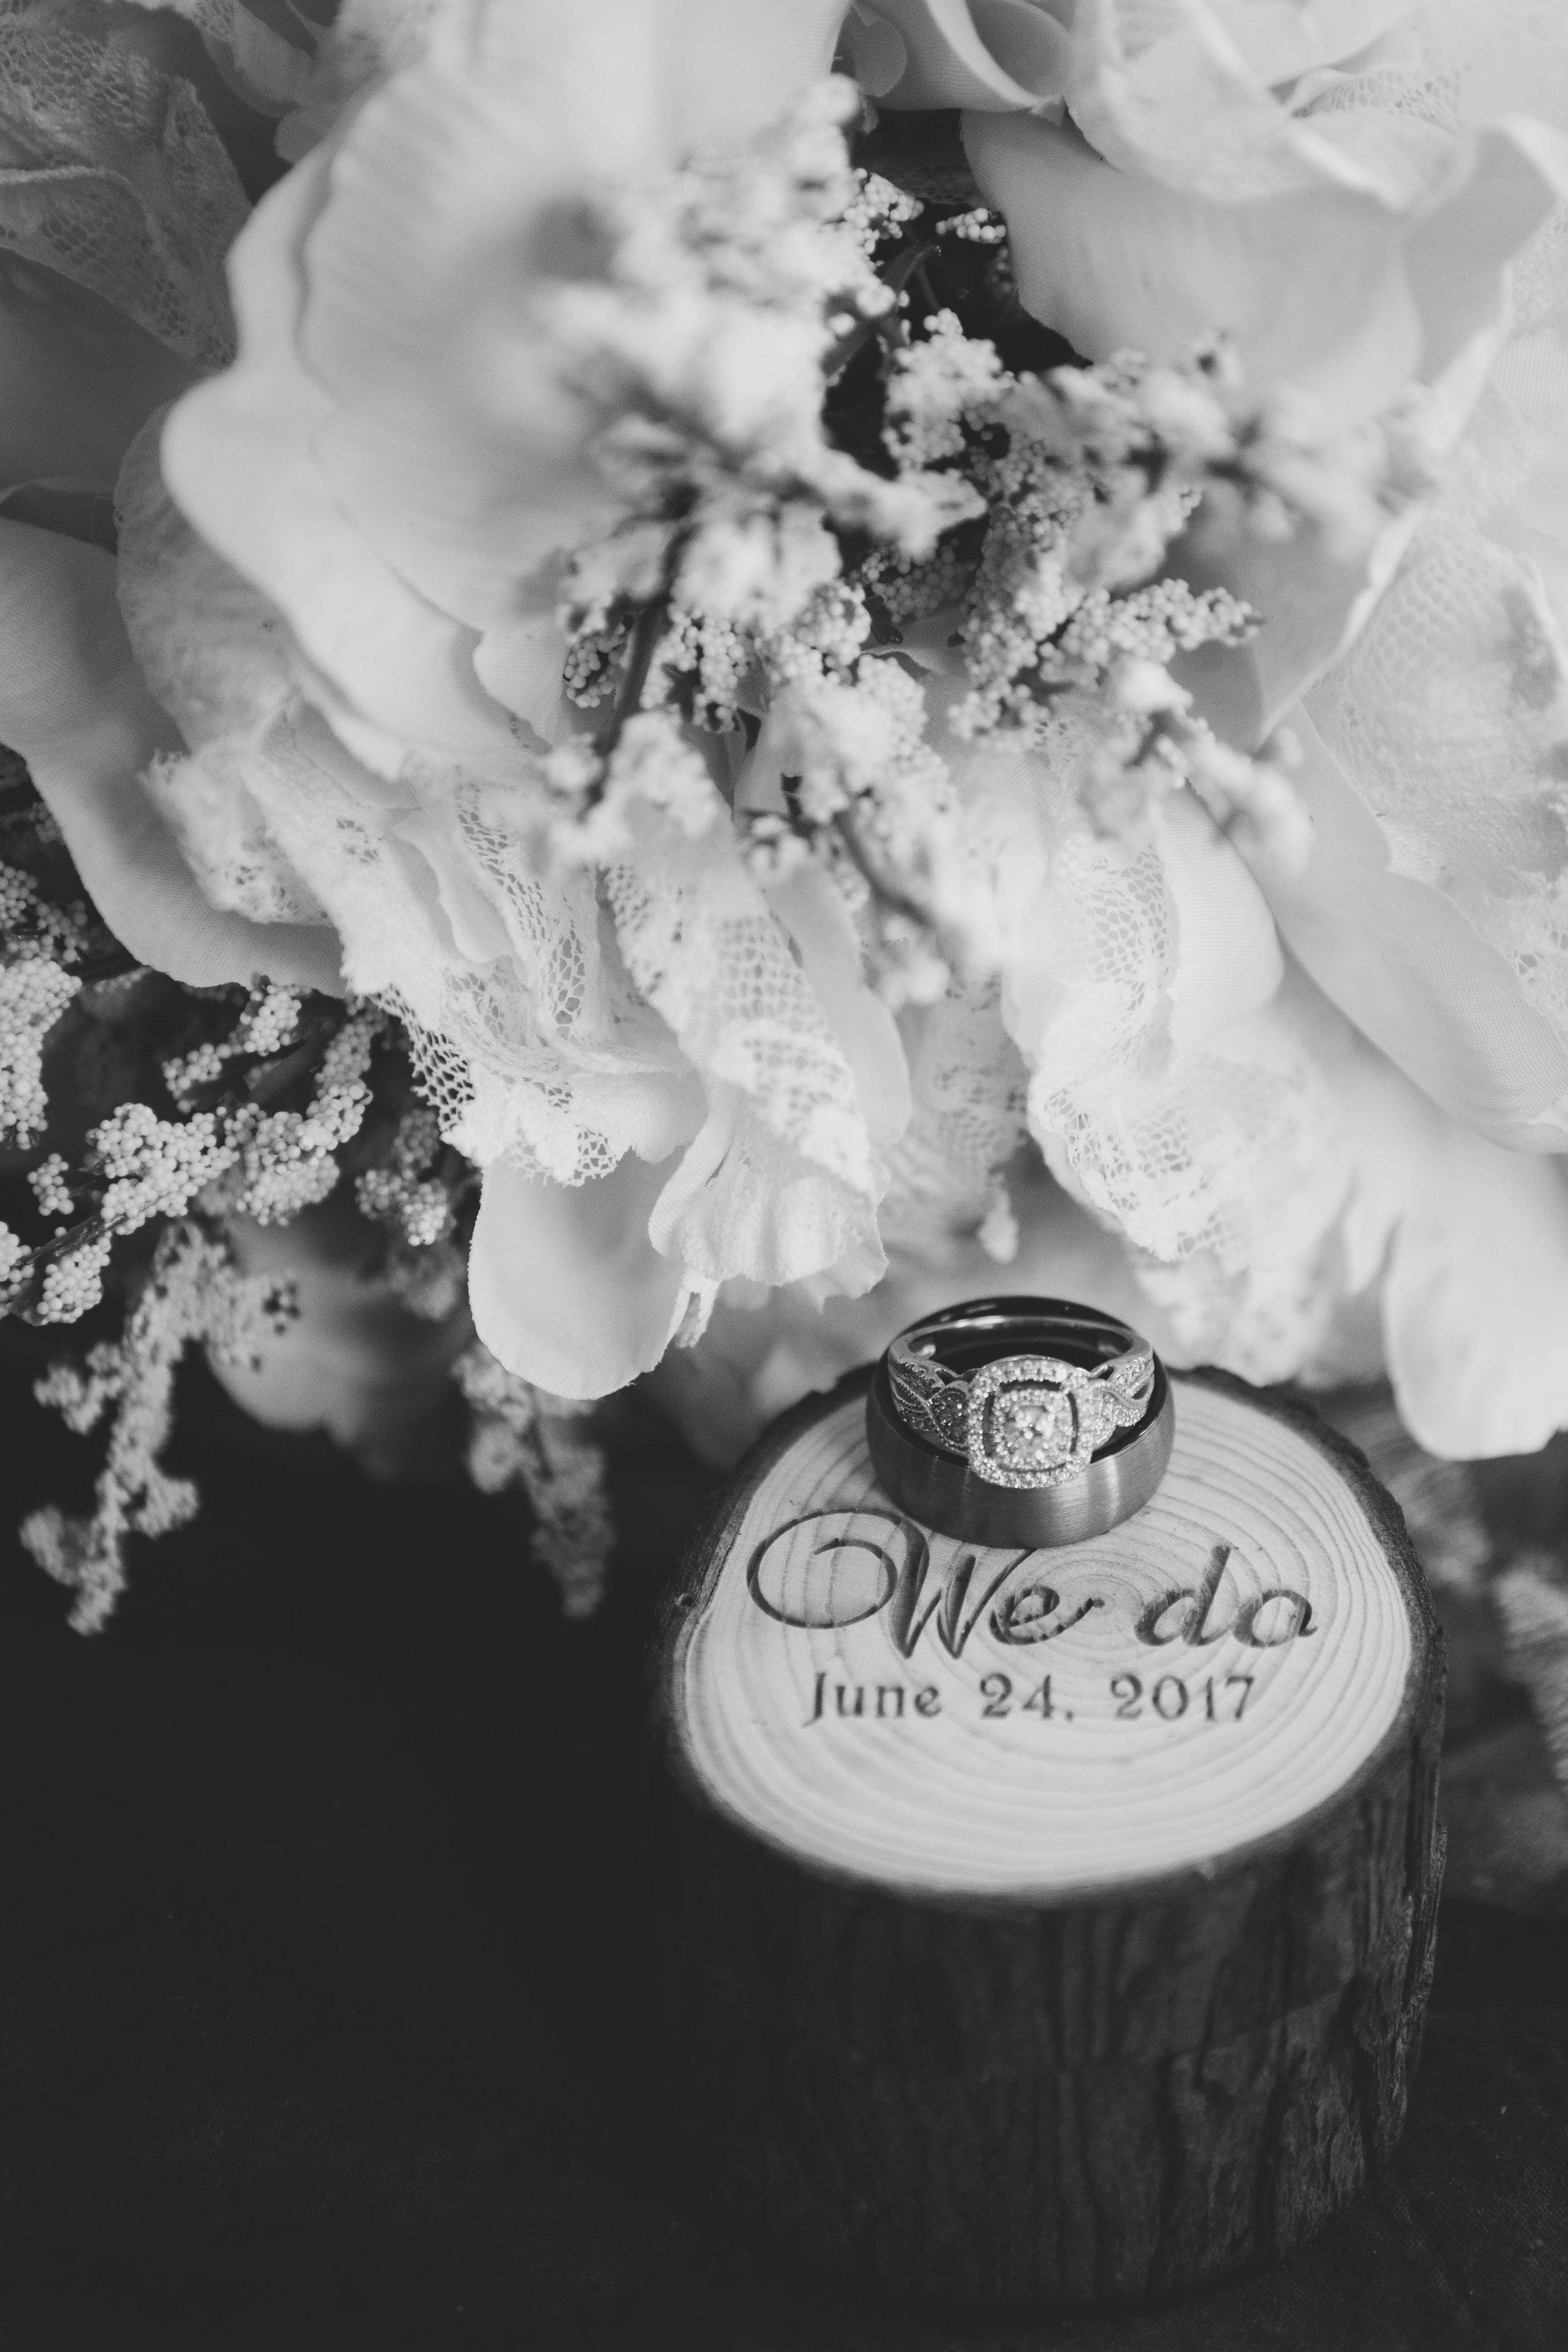 Jeffrey-biri-los angeles- wedding-photographer